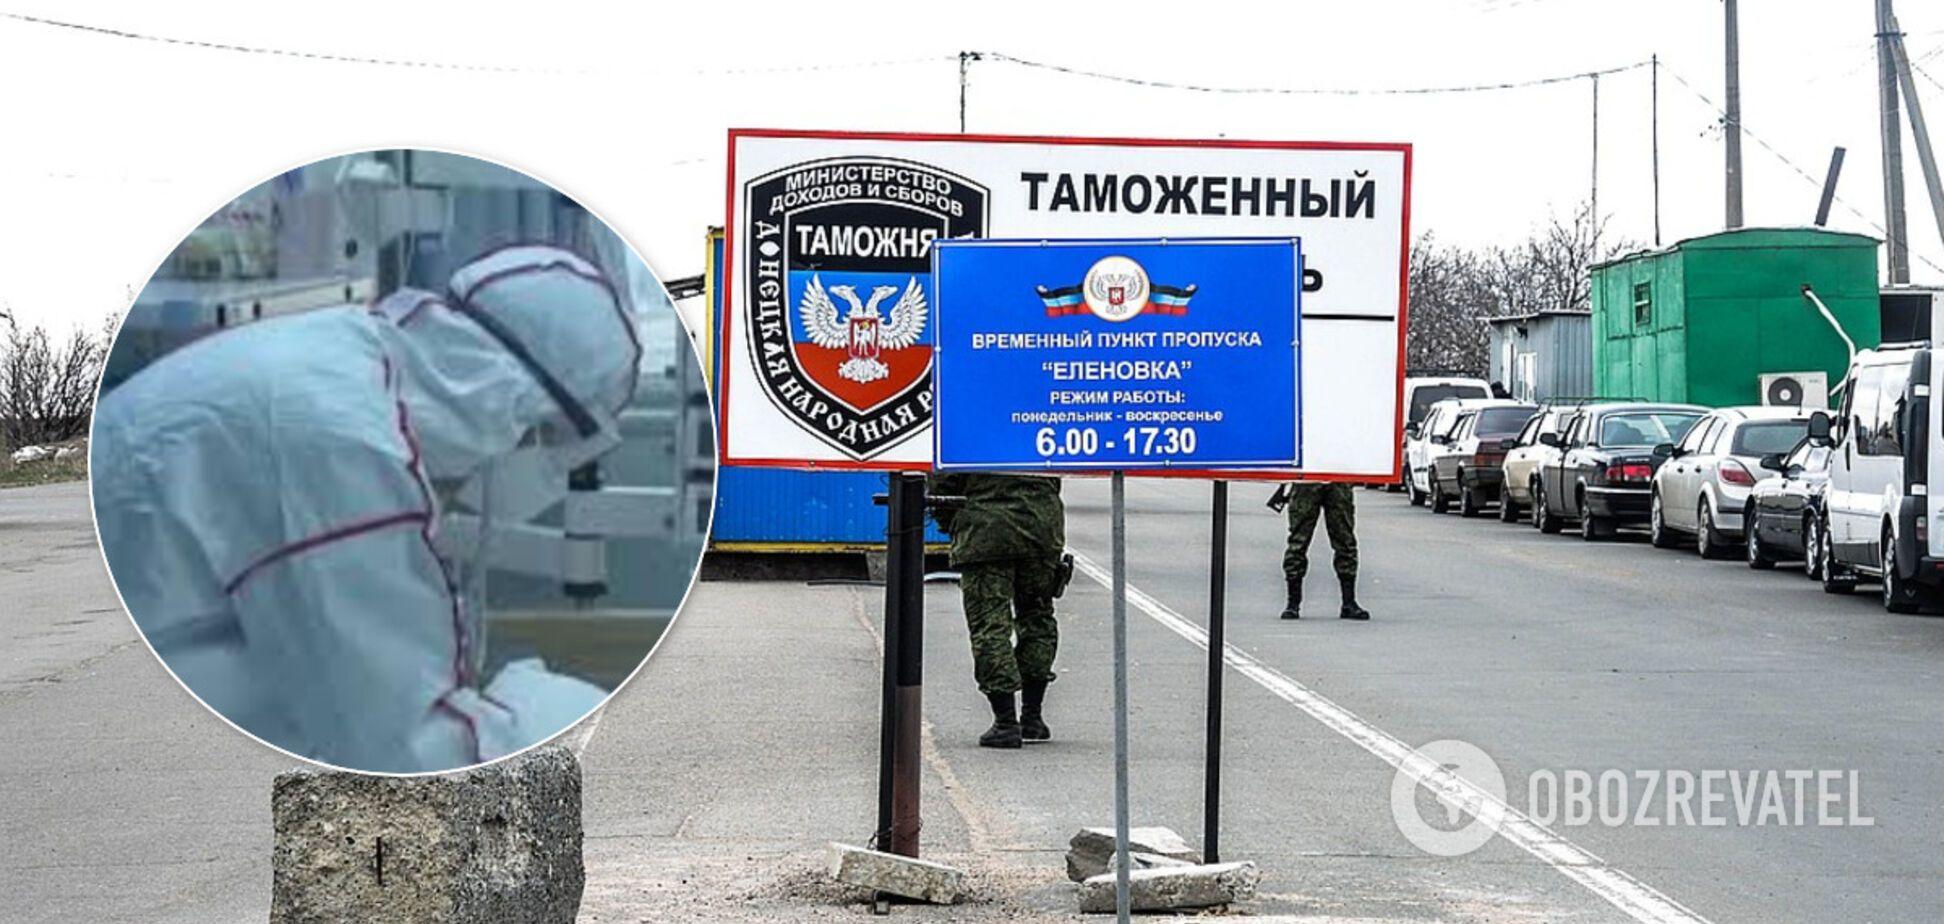 Донбасс 'закрыли' на карантин из-за коронавируса: общественники устроили скандал